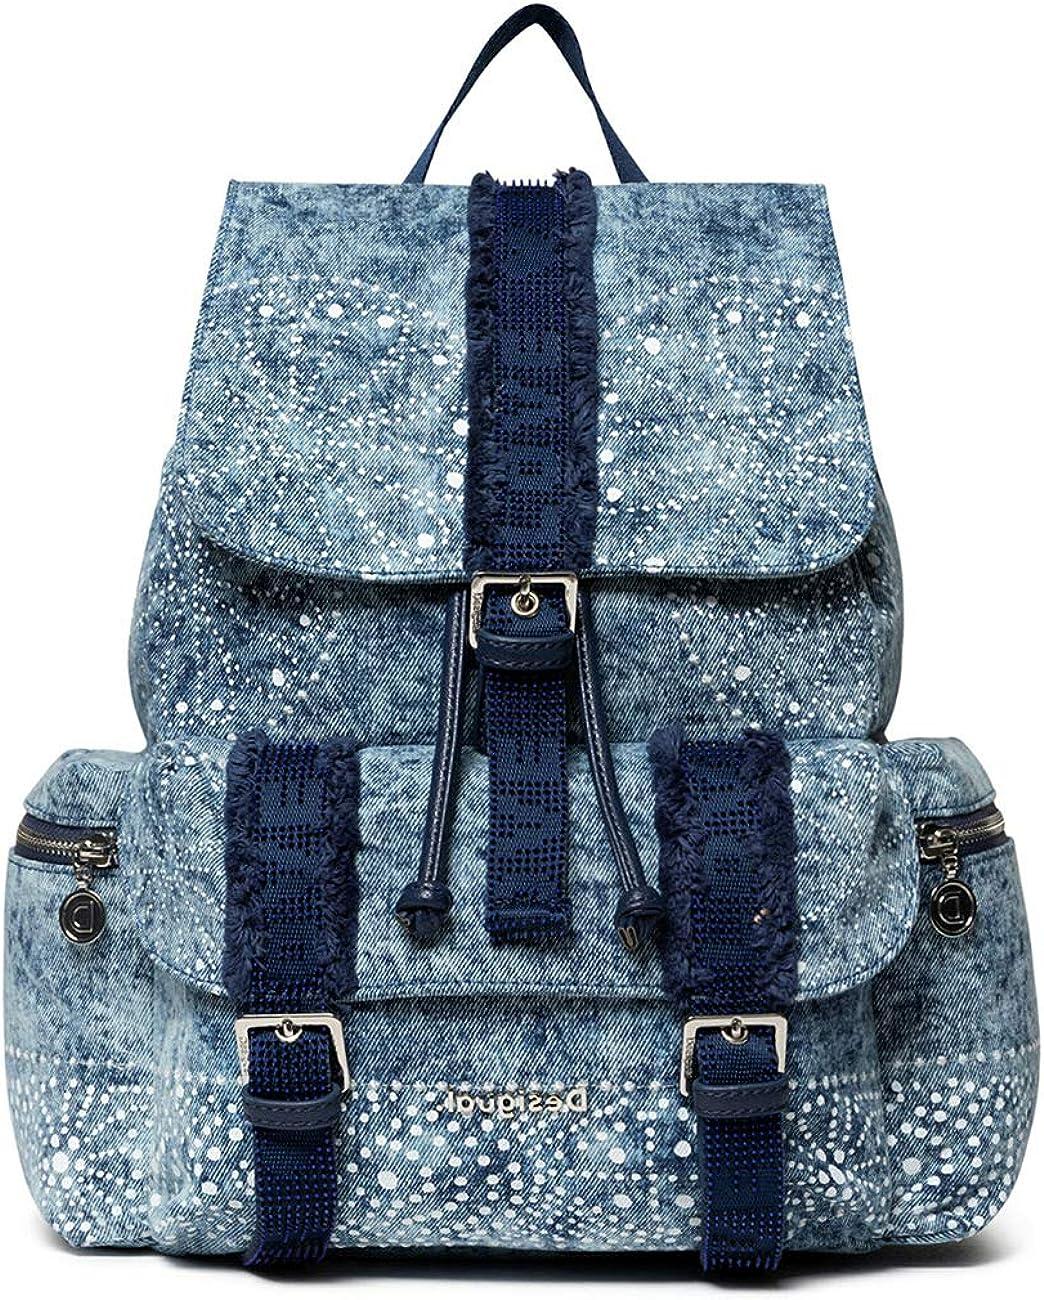 Desigual Back_Galaxy Tribeca - Bolso de mano para mujer, 15 x 36 x 29 cm, color azul marino